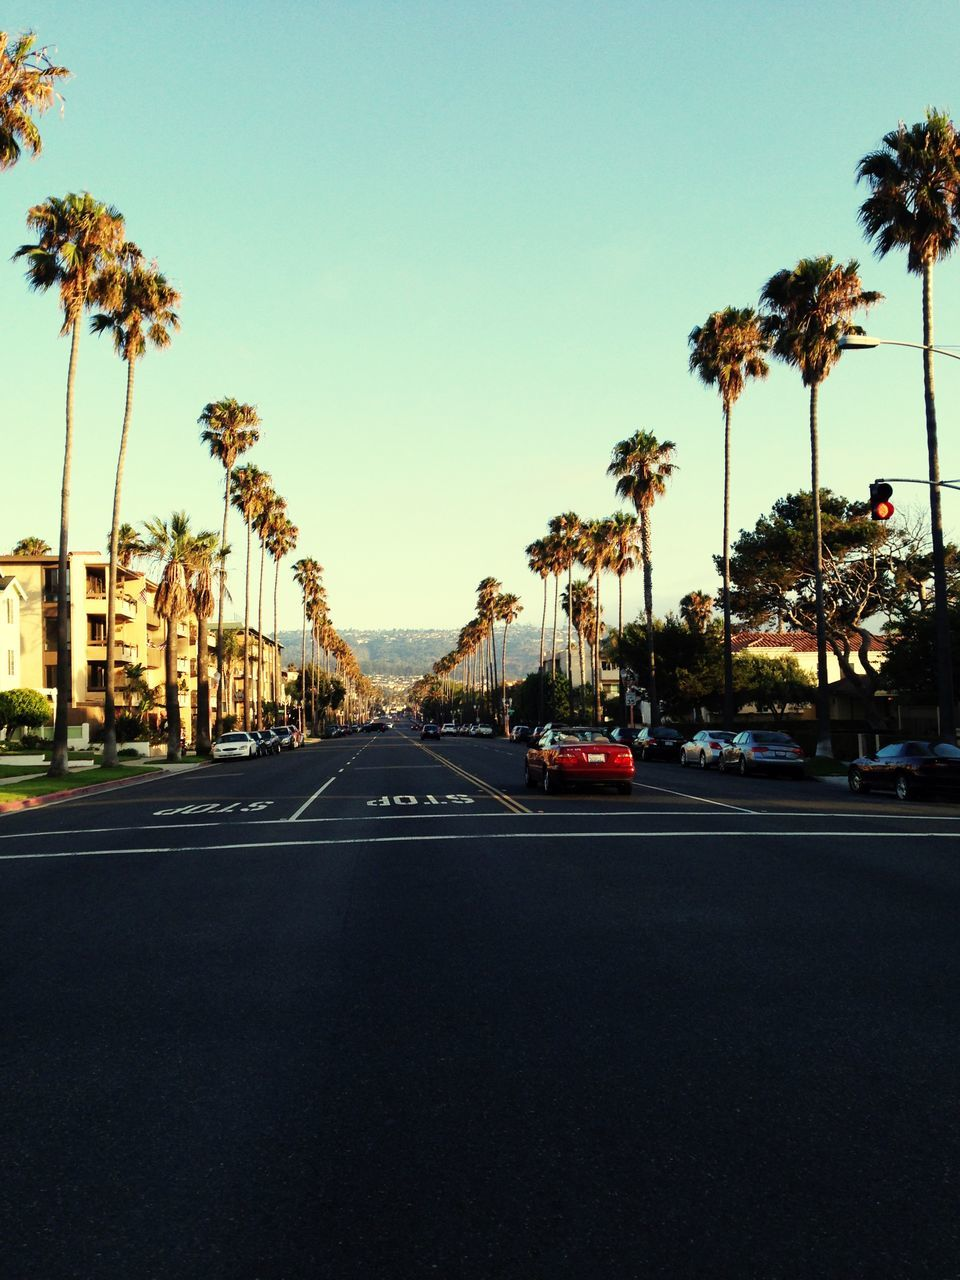 Cars On City Street Amidst Palm Trees Against Clear Sky